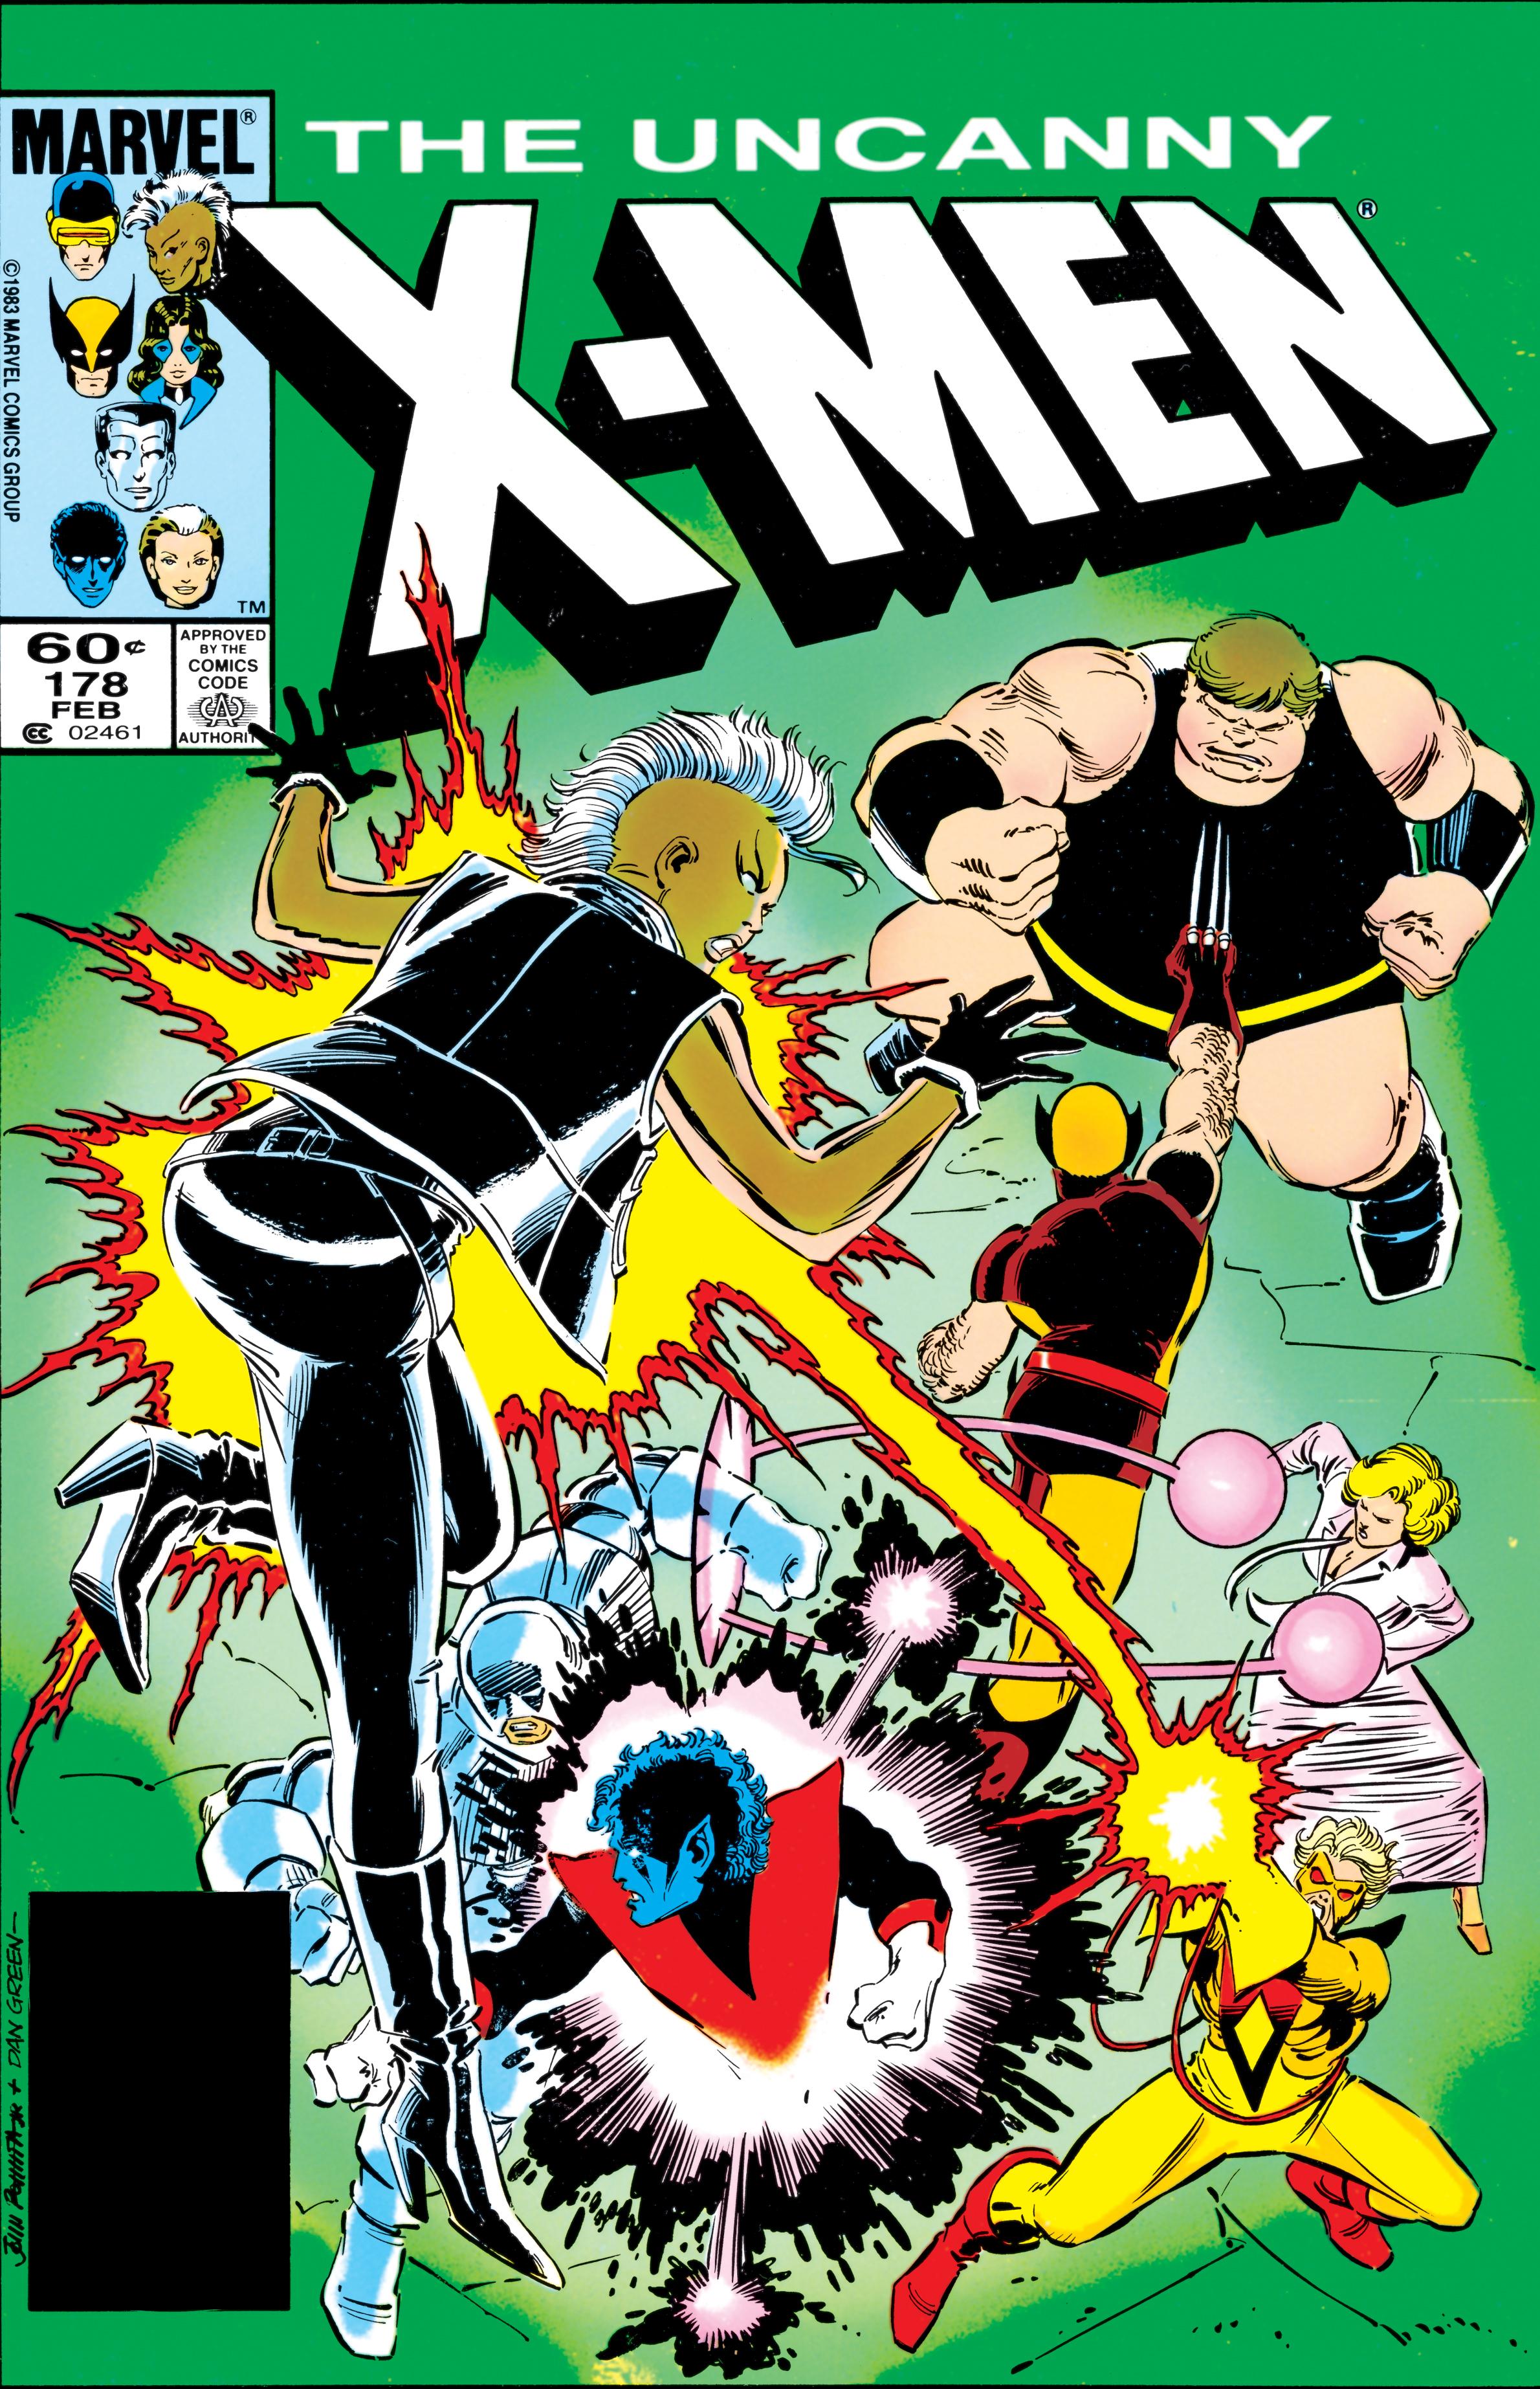 Uncanny X-Men (1963) #178